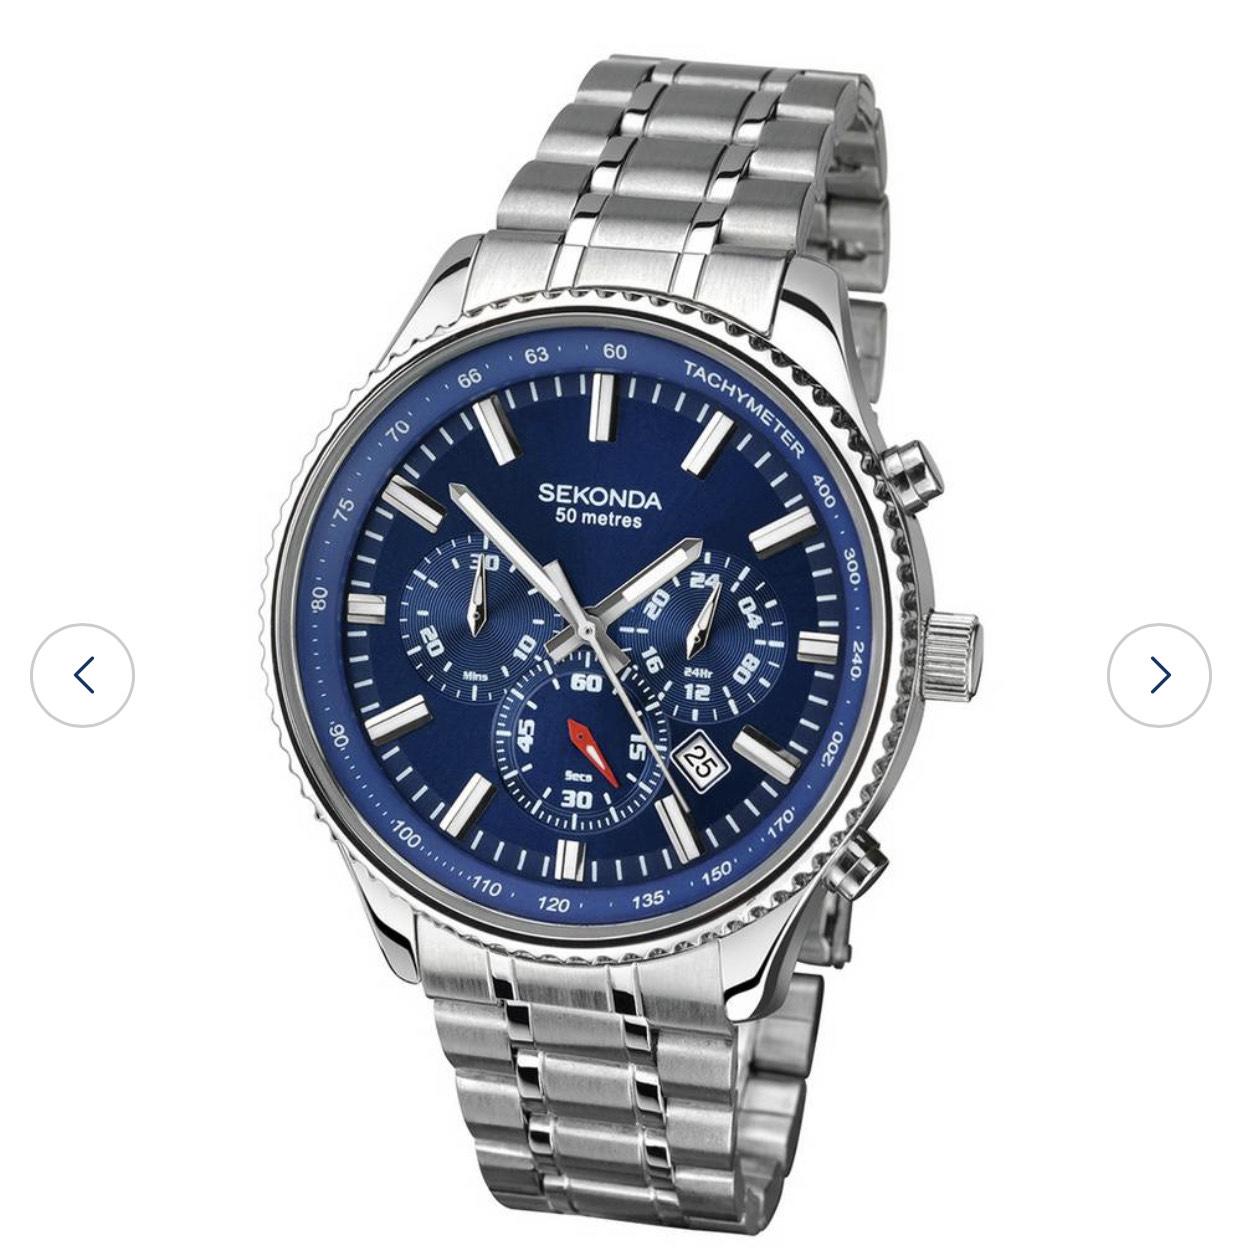 Sekonda Men's Dual Time Stainless Steel Bracelet Watch - £43.94 Delivered @ Argos